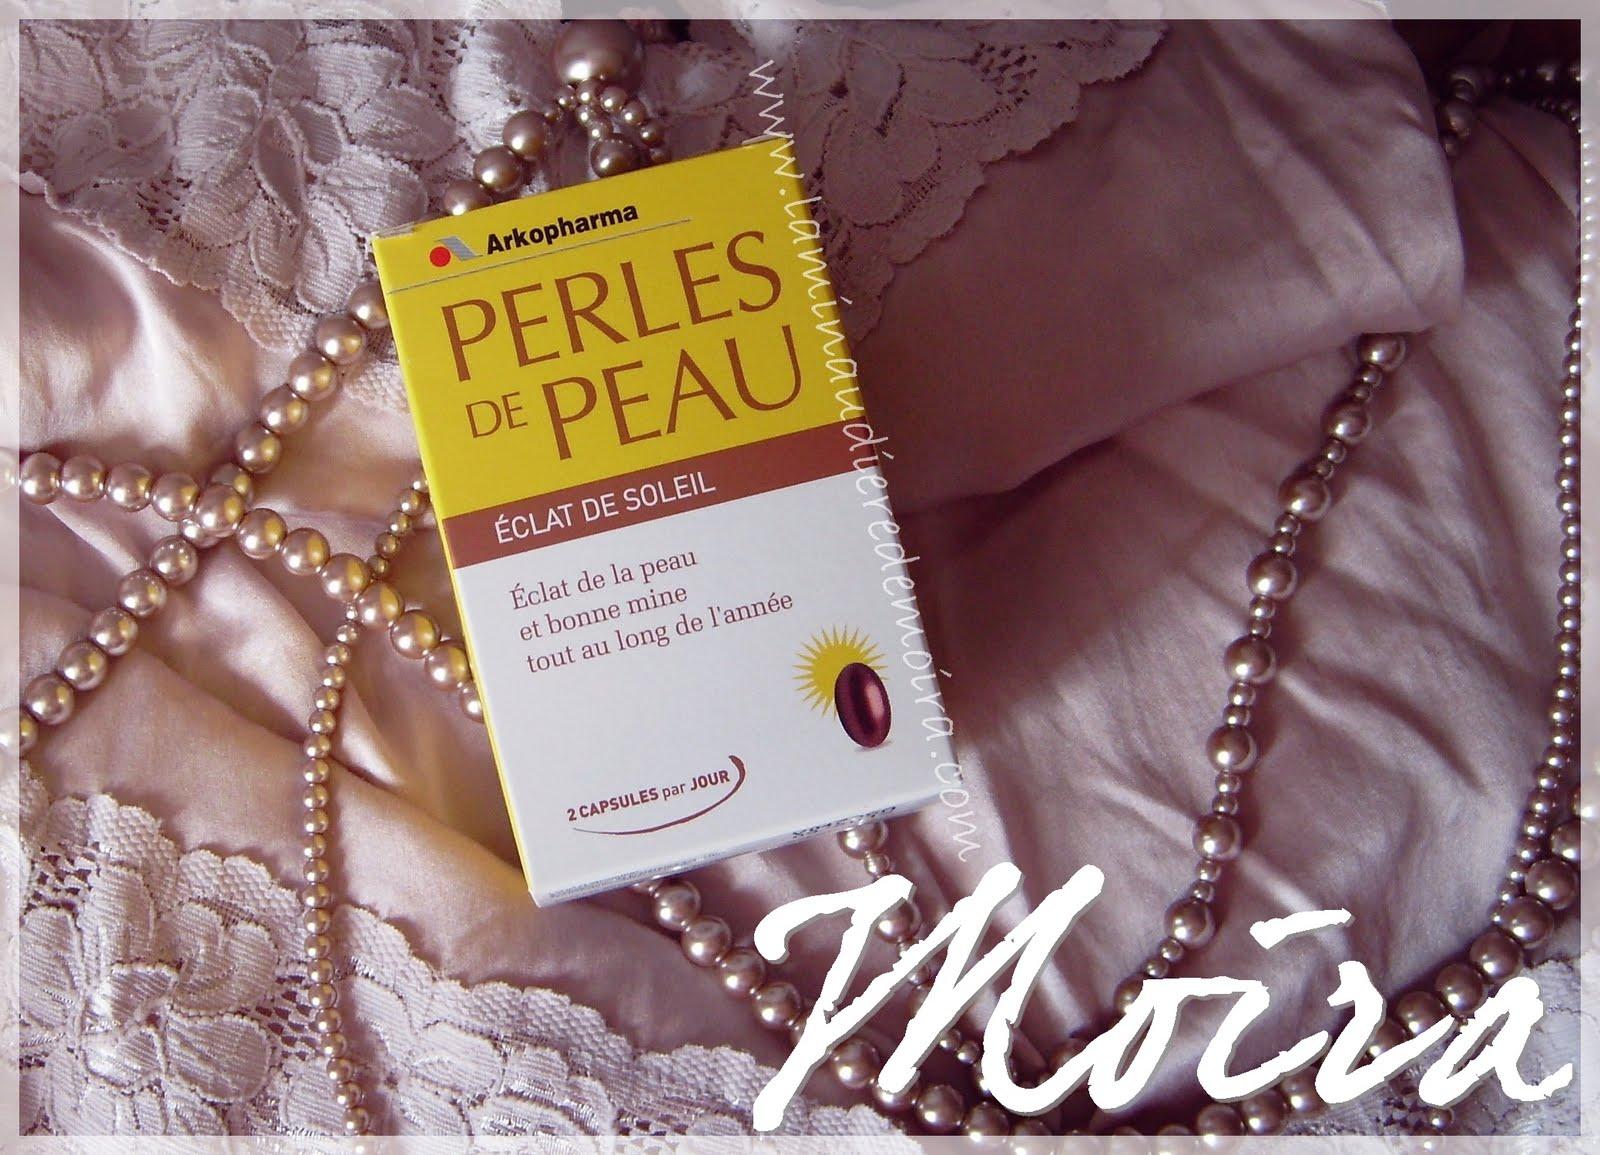 perles de peau eclat de soleil